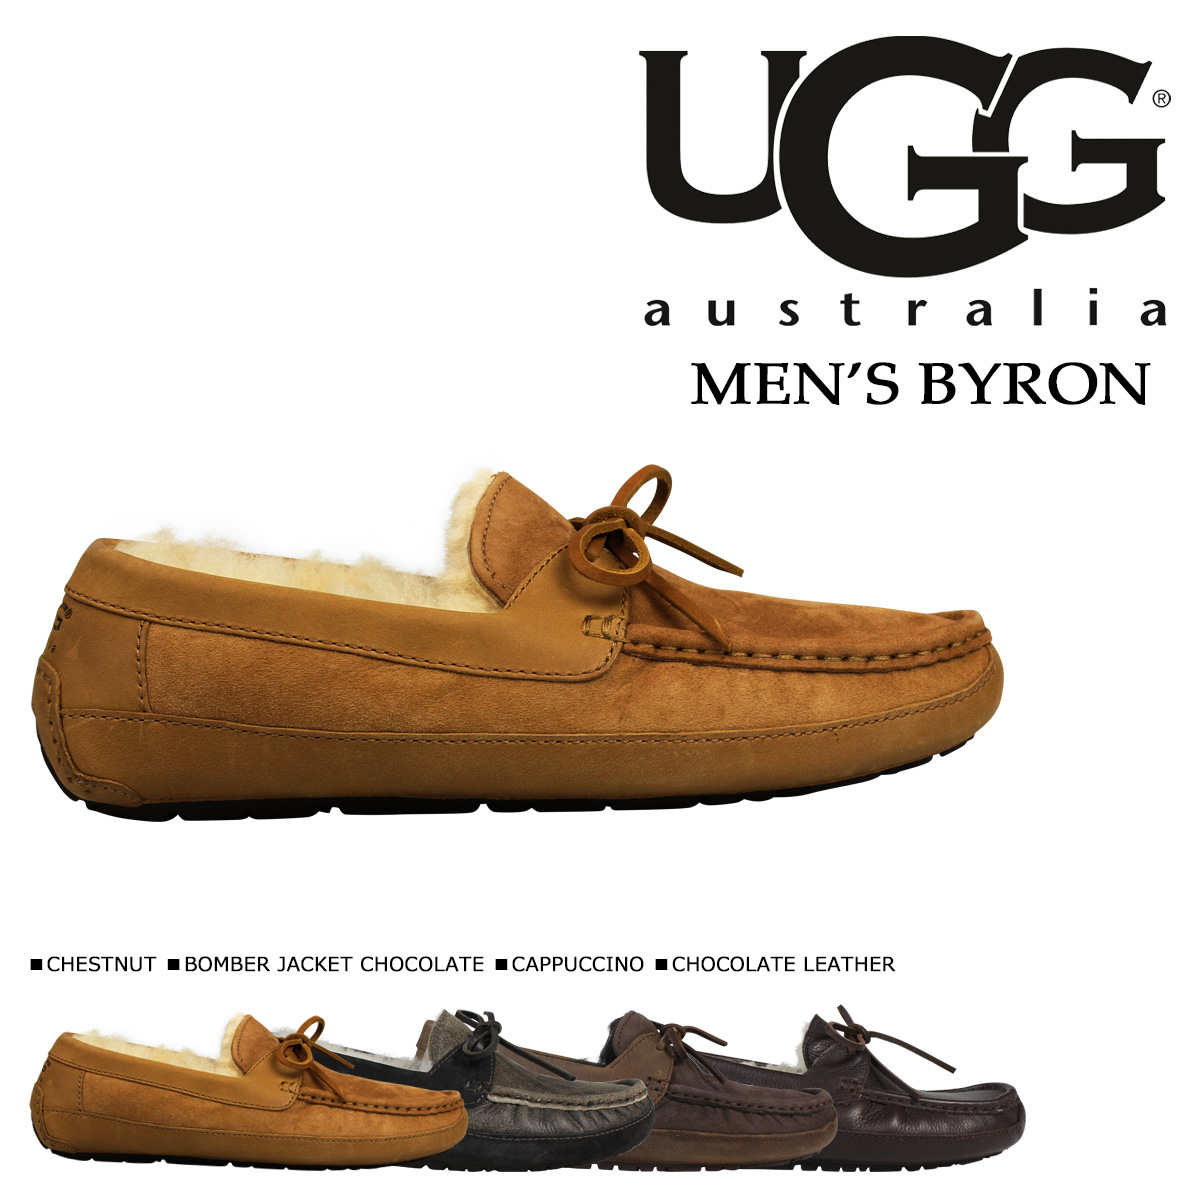 39% ☆ UGG UGG men's Byron moccasin shoes 5102 5161 MENS BYRON SHEEPSKIN Shearling Sheepskin